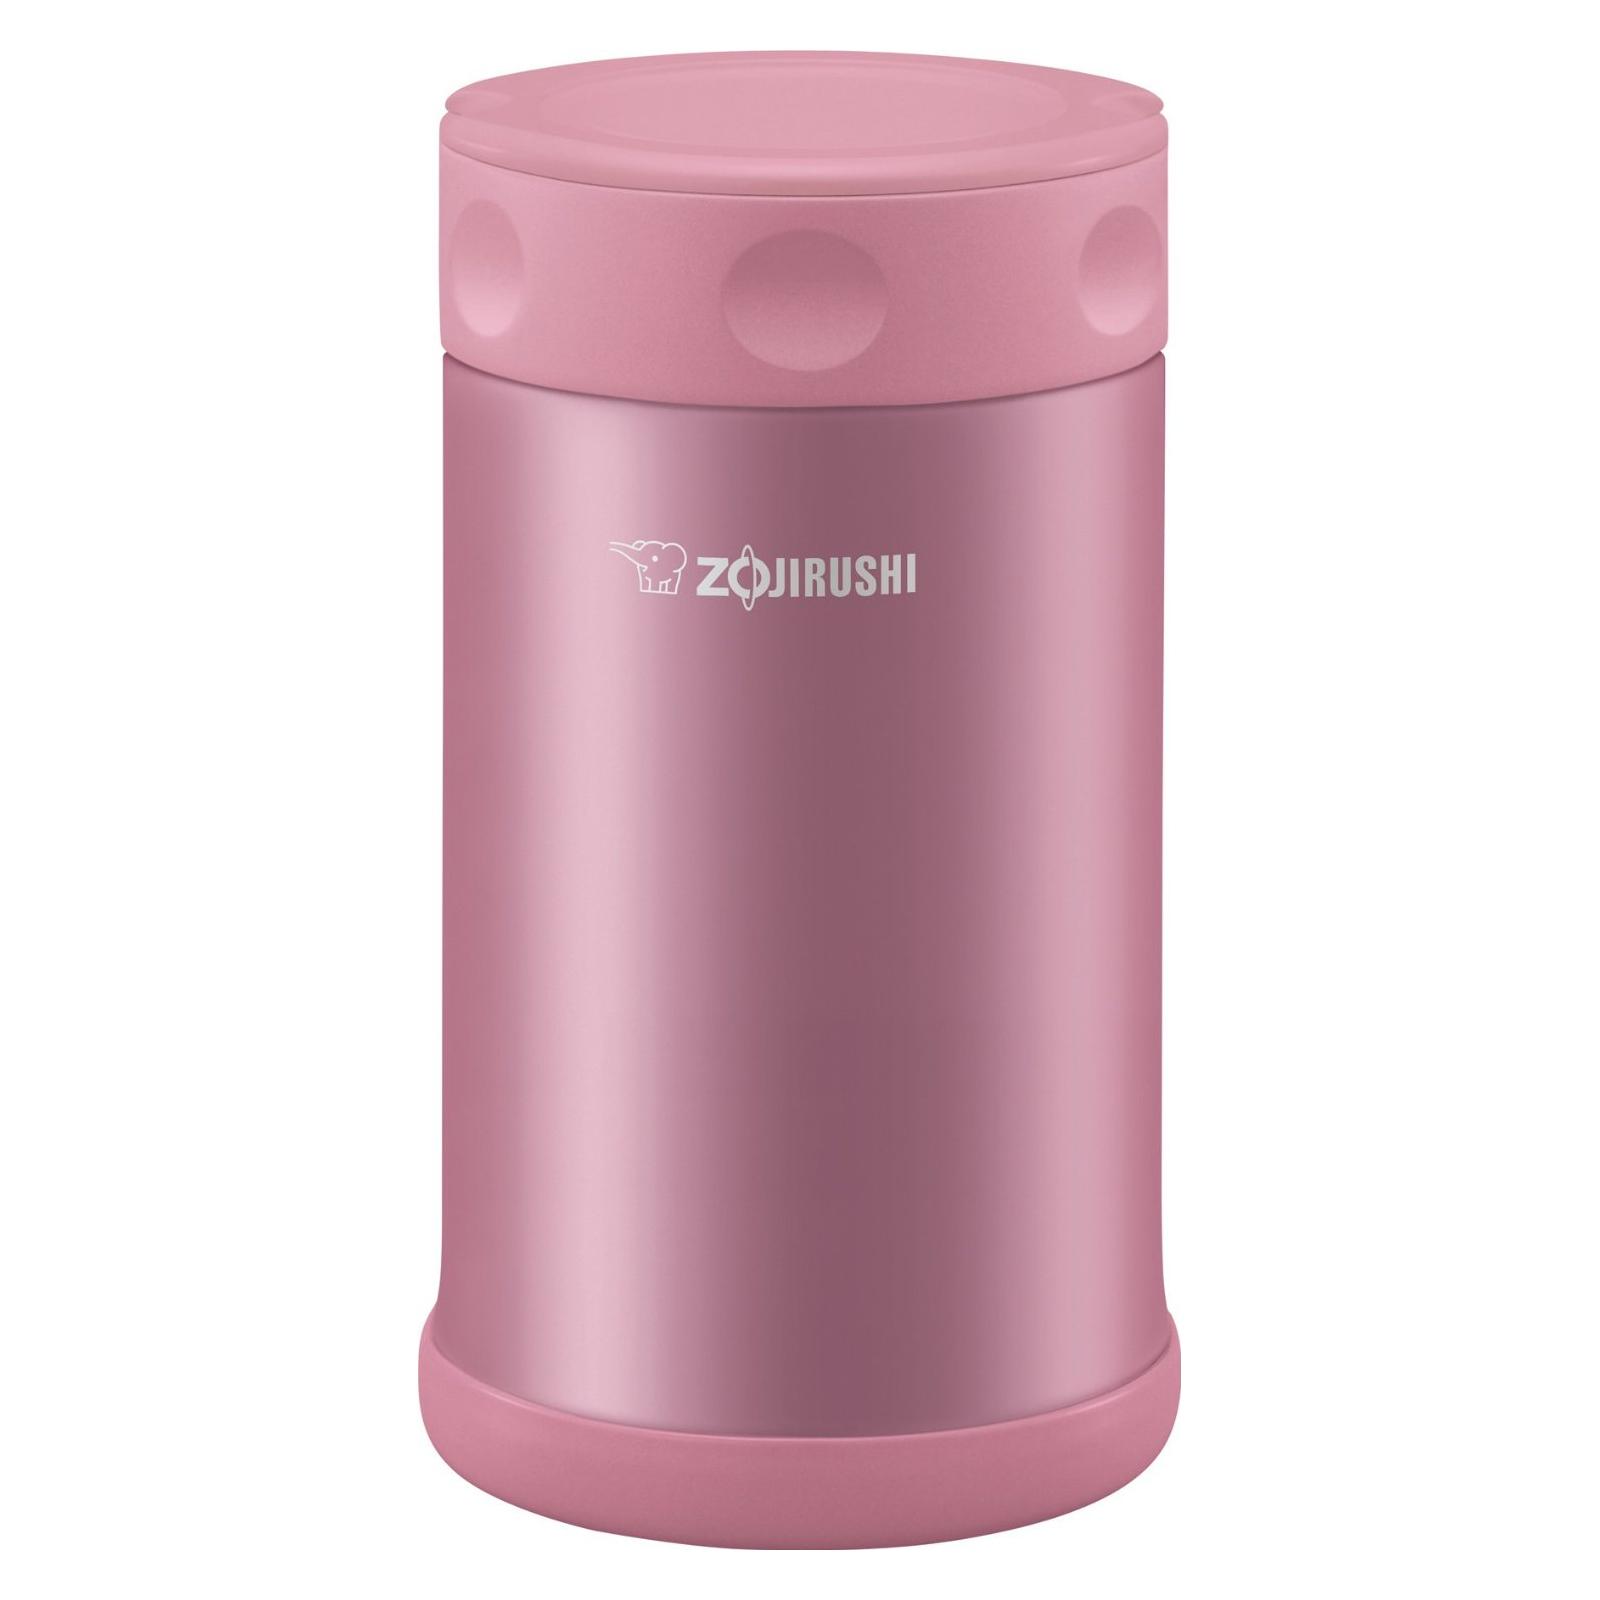 Zojirushi Pink Stainless Steel 25 Ounce Food Jar